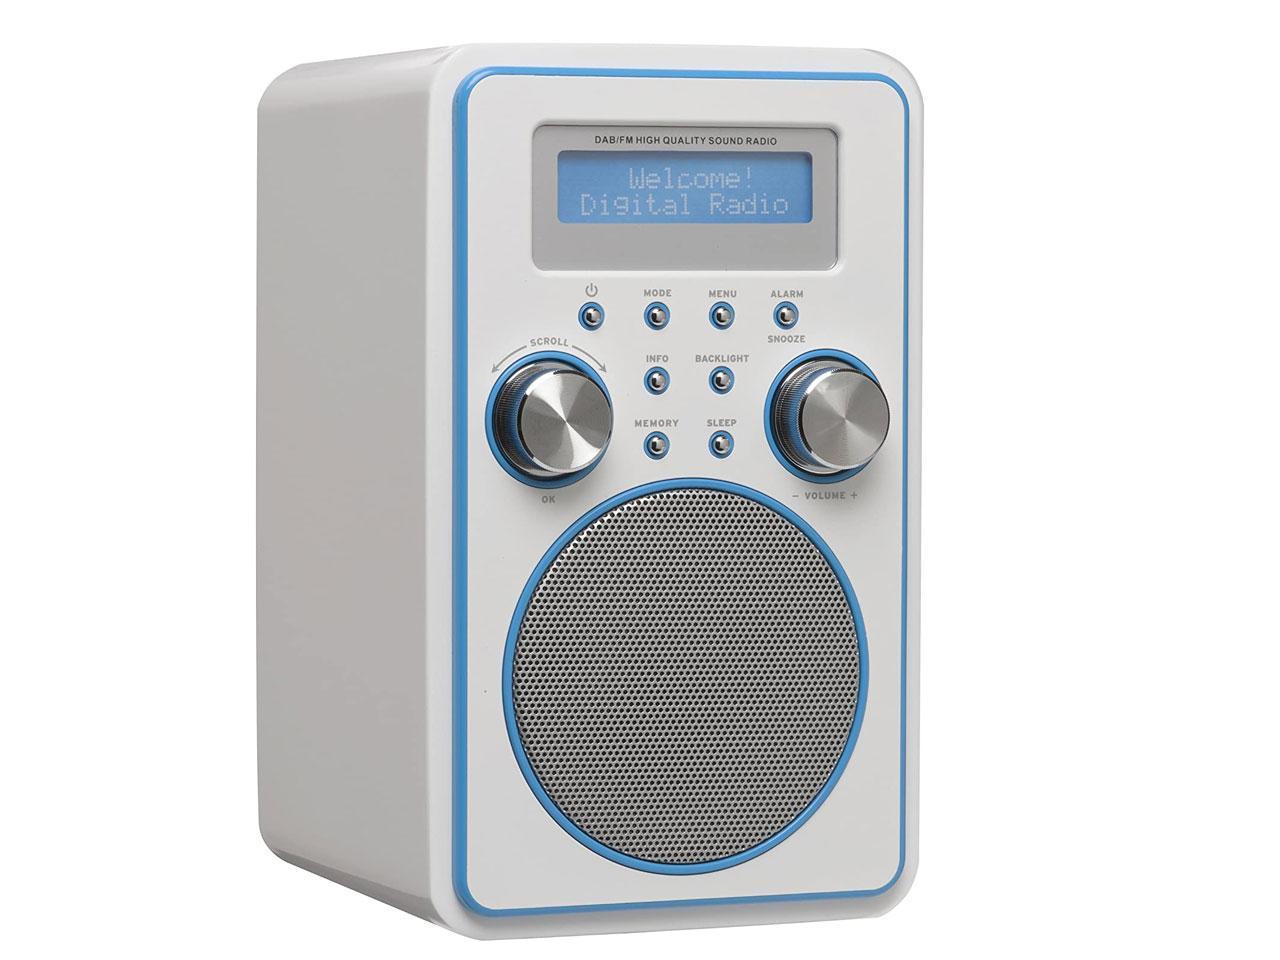 DENVER DAB-45 Plus, bílo-modrý + záruka 3 roky! | CHAT on-line podpora PO-NE do 23 hodin!!